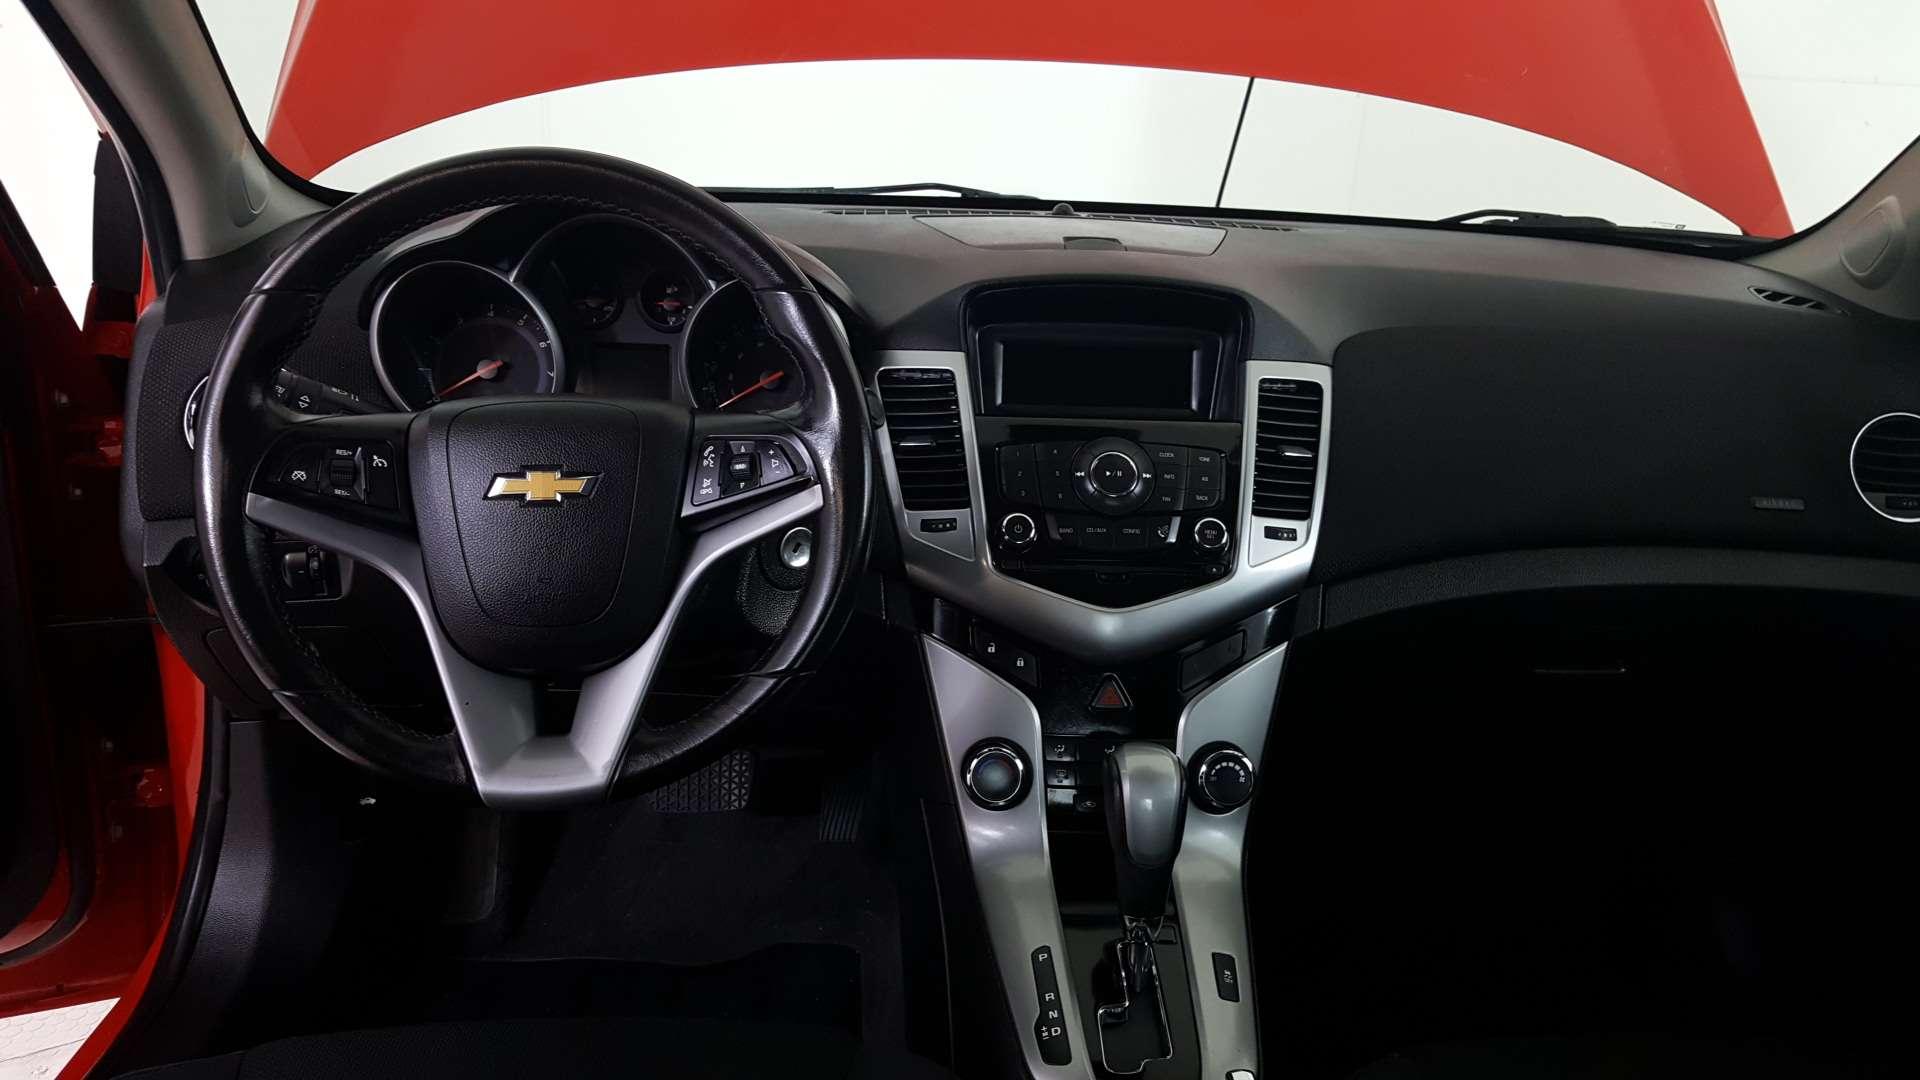 2014 Chevrolet Cruze: Certified Car in Winnipeg MB, Stock